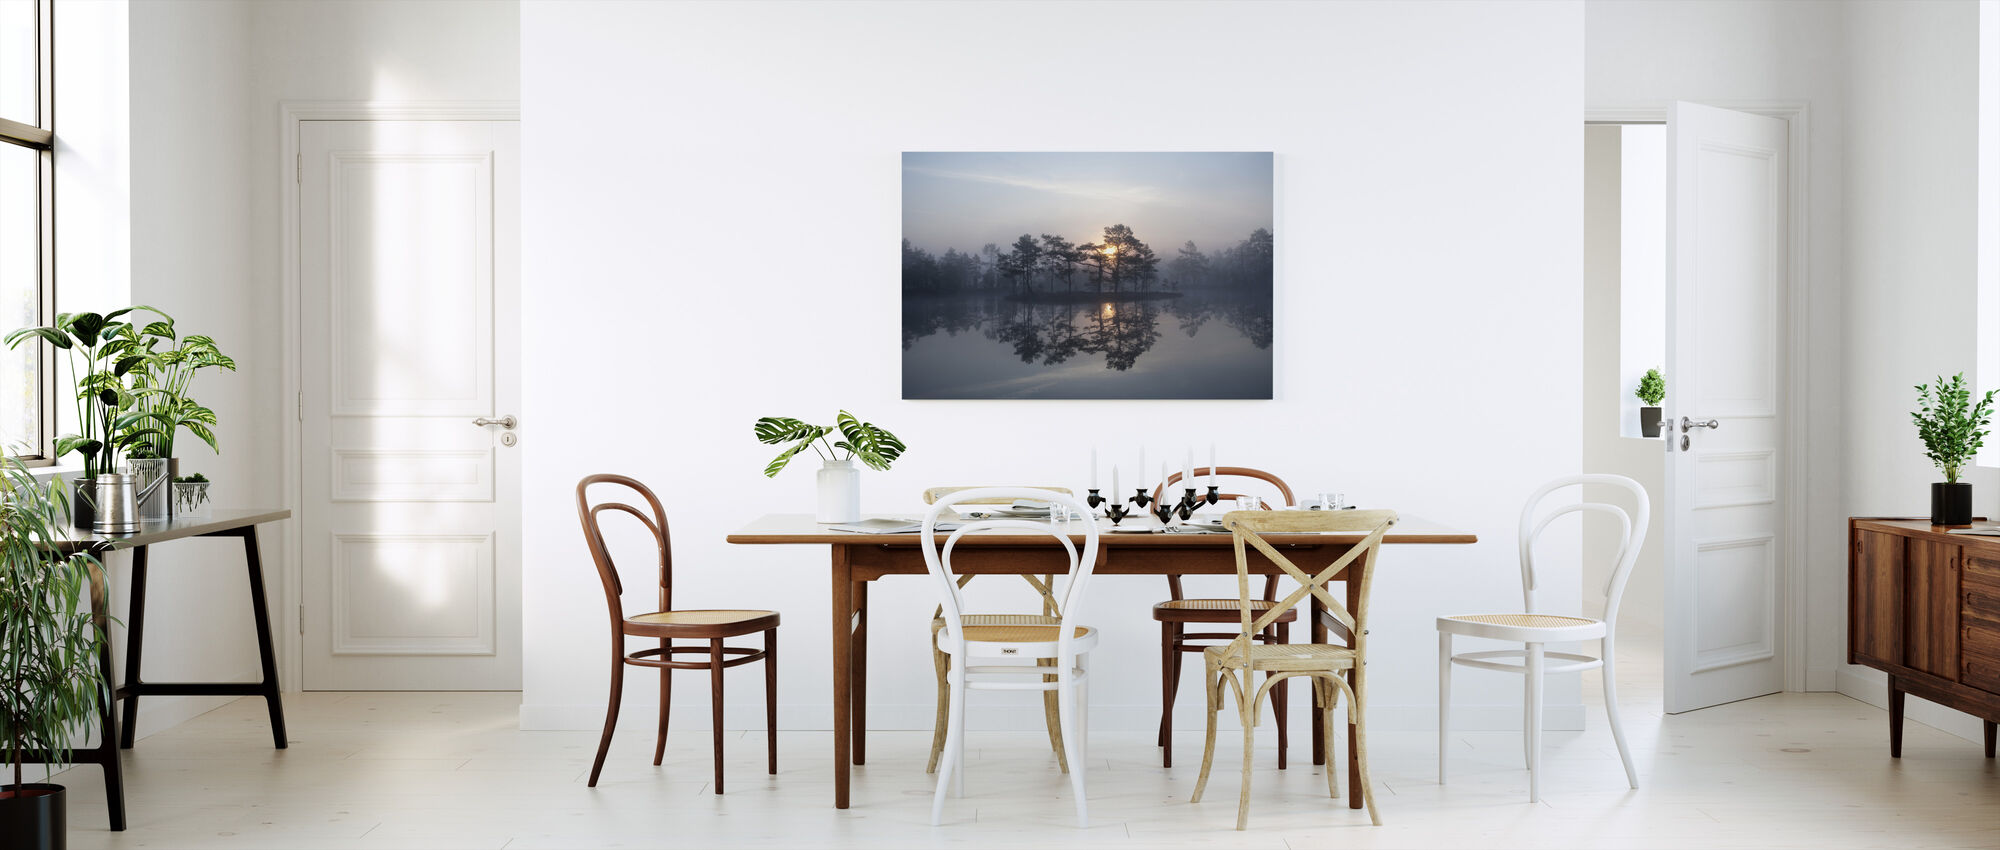 Lumoava sumu - Canvastaulu - Keittiö